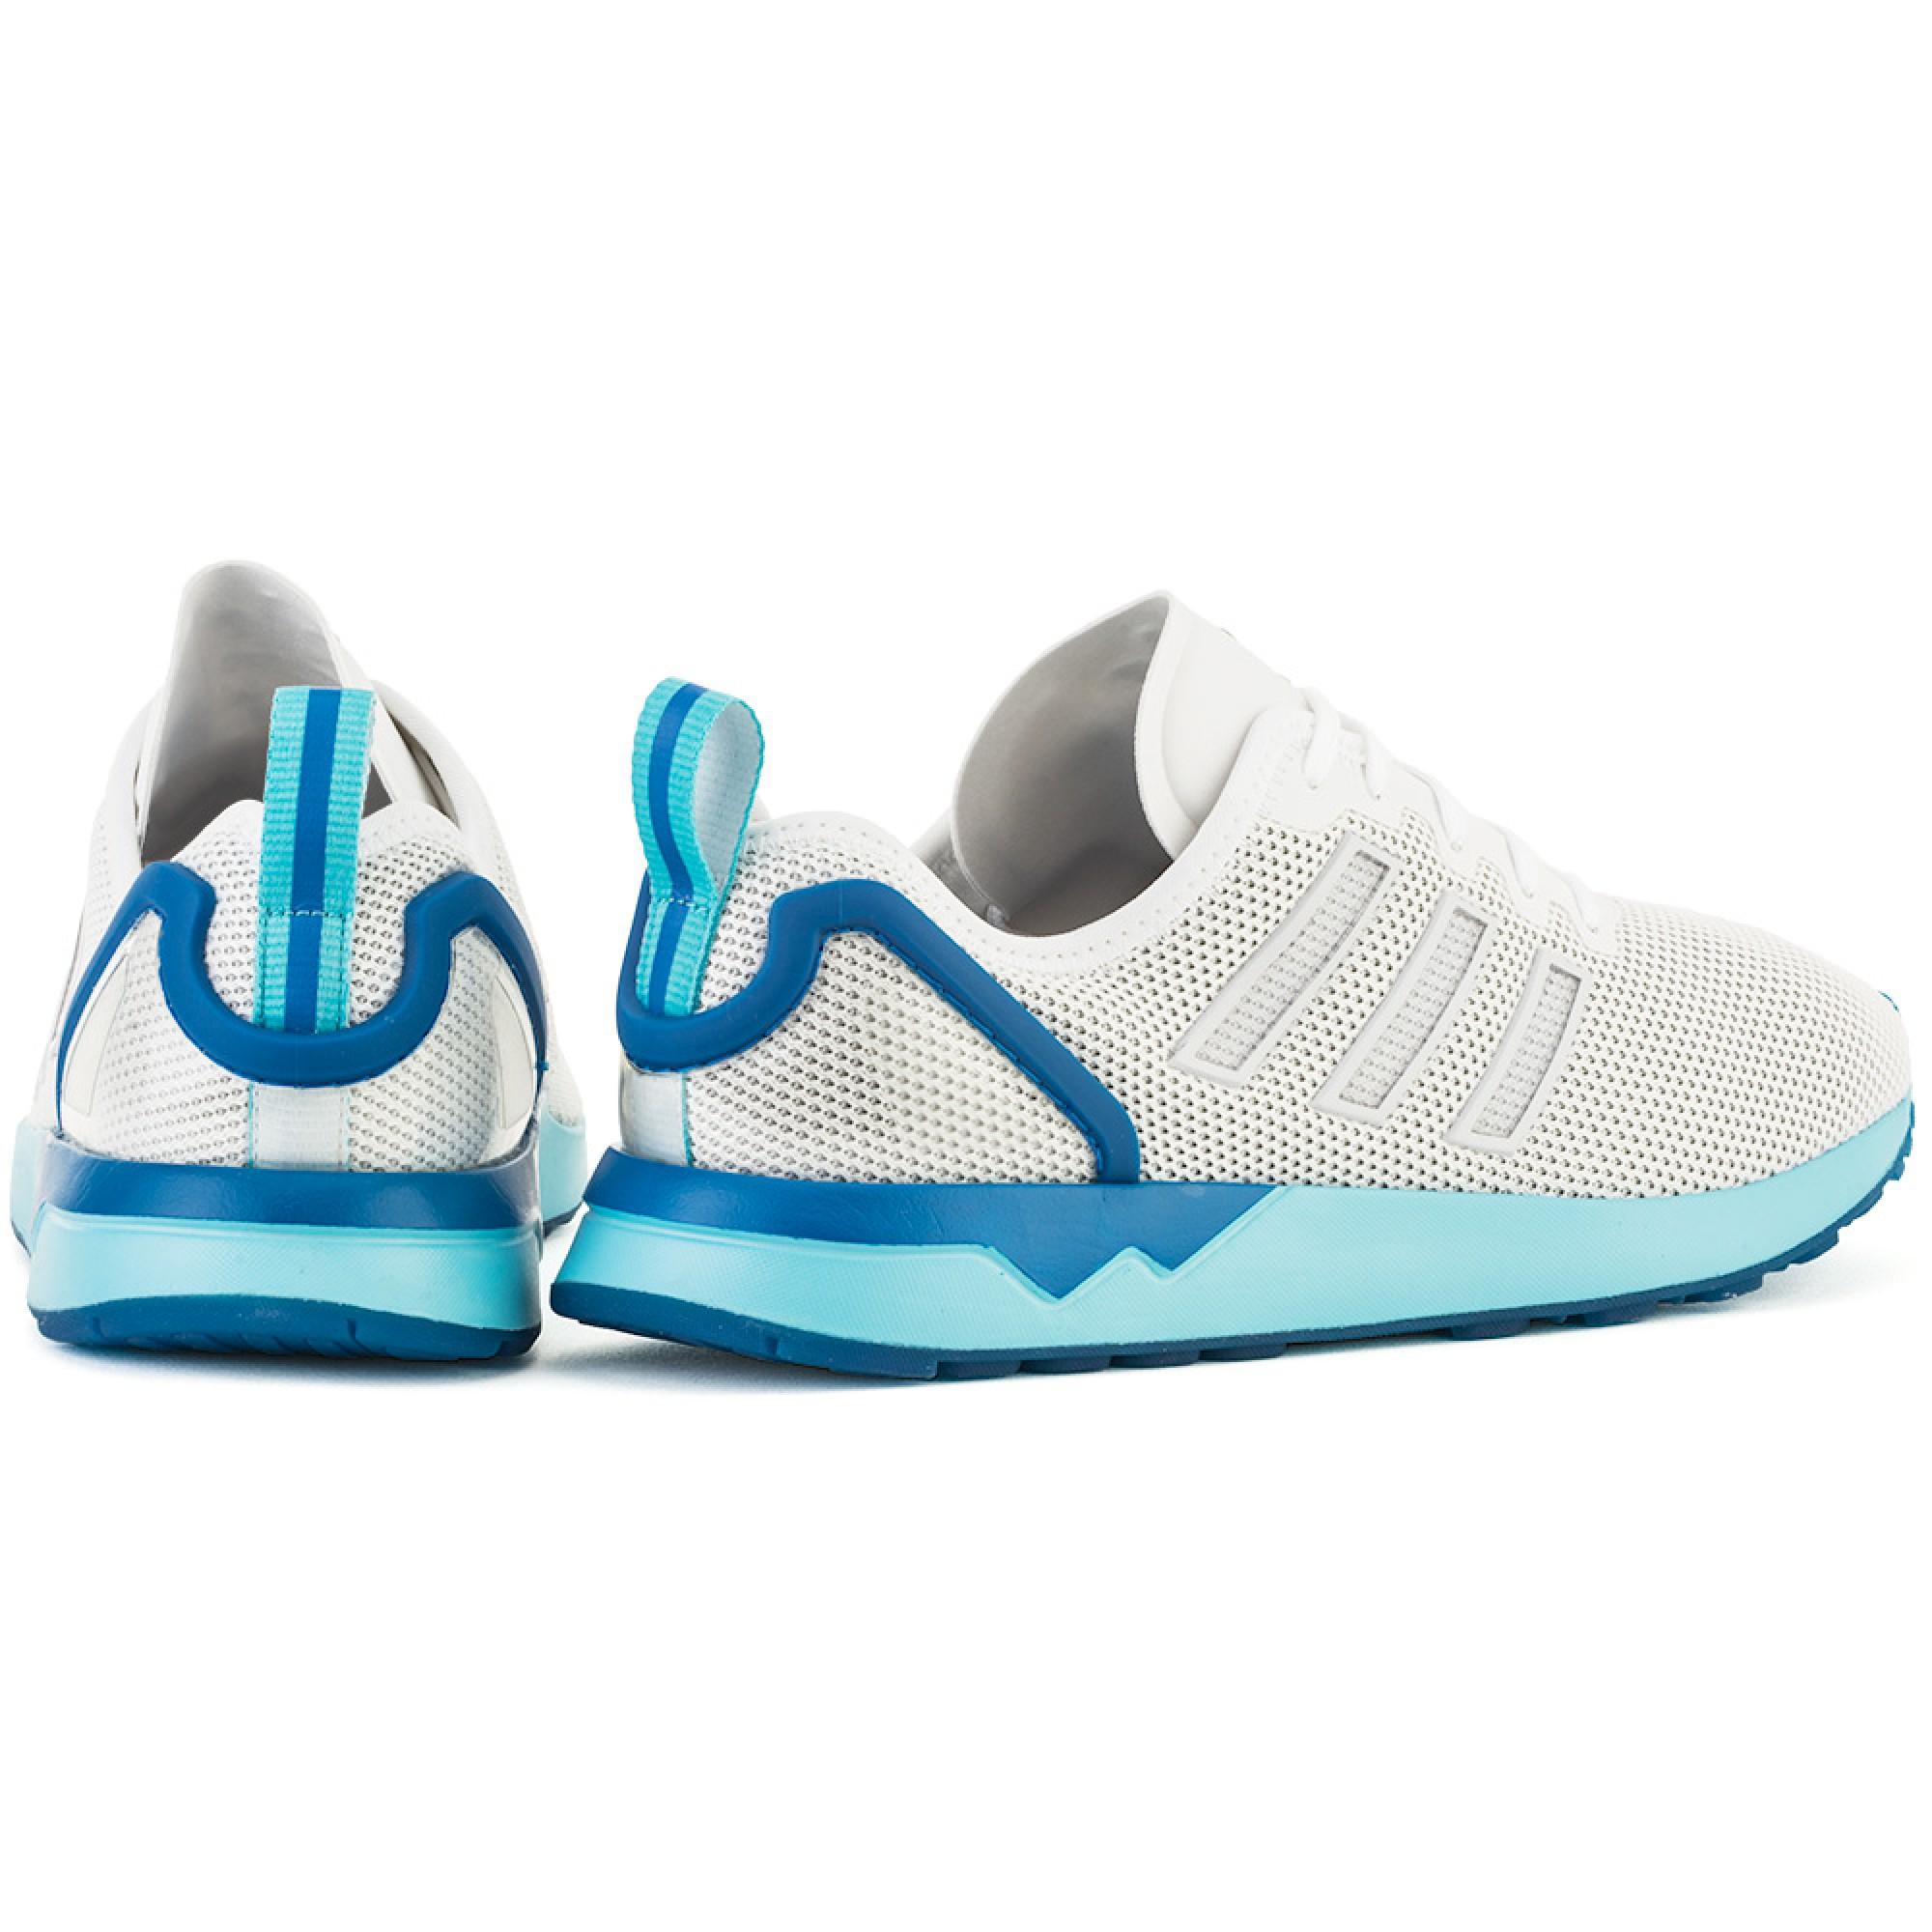 S79014 adidas ZX Flux ADV Vintage White Blue Glow S79014